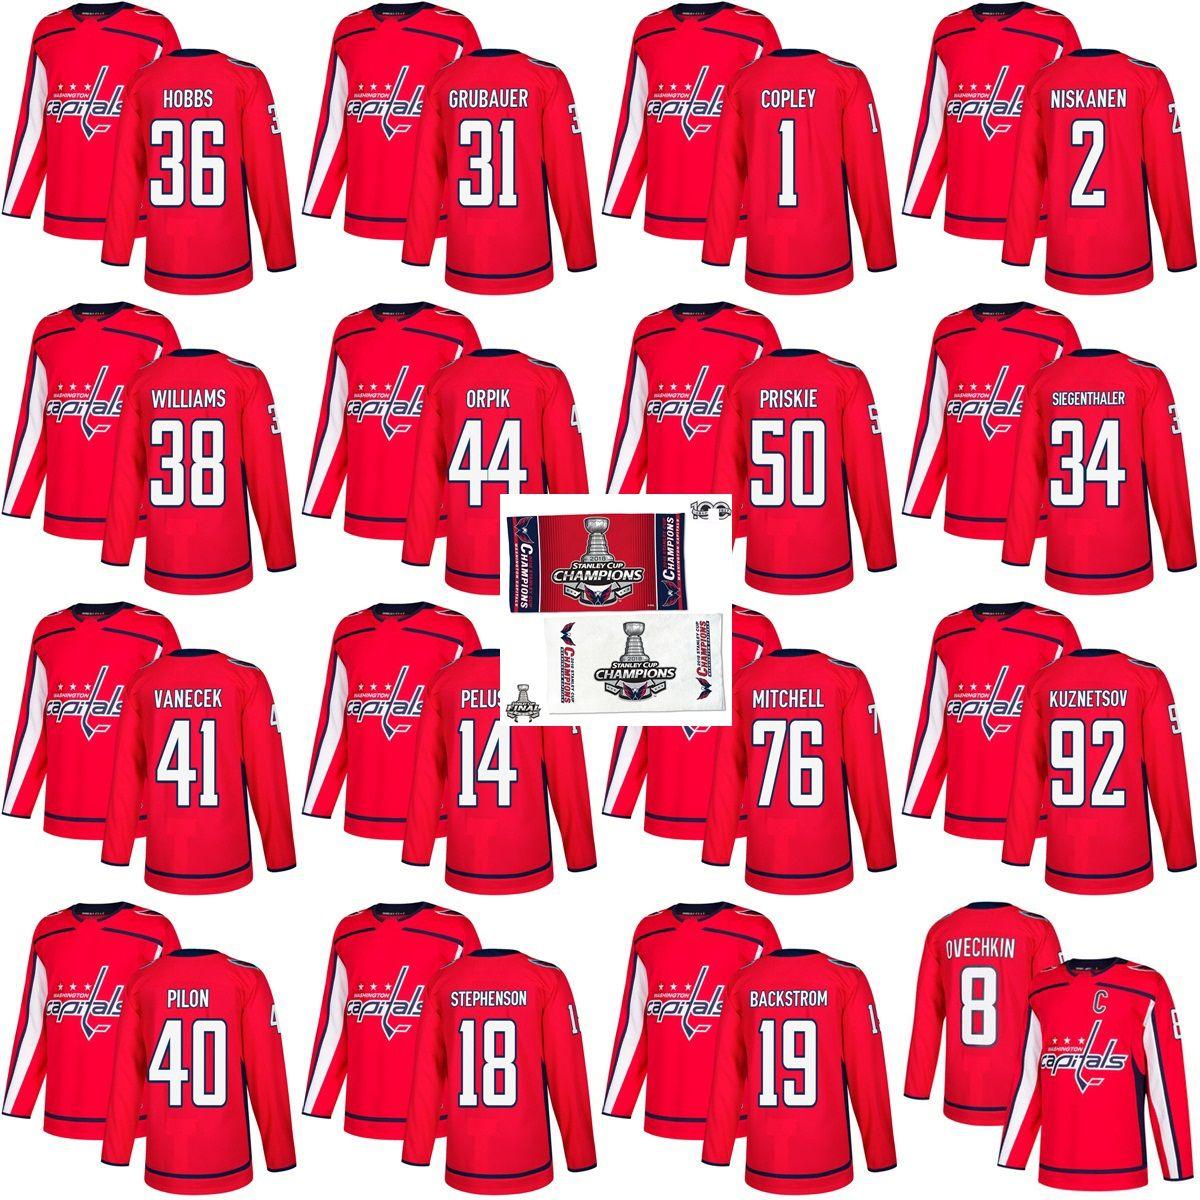 fff0a3628 2019 2018 Stanley Cup Final Champion Patch Washington Capitals Hockey Jersey  Nicklas Backstrom Alex Ovechkin Pheonix Copley Grubauer Brooks Orpik From  Cn ...